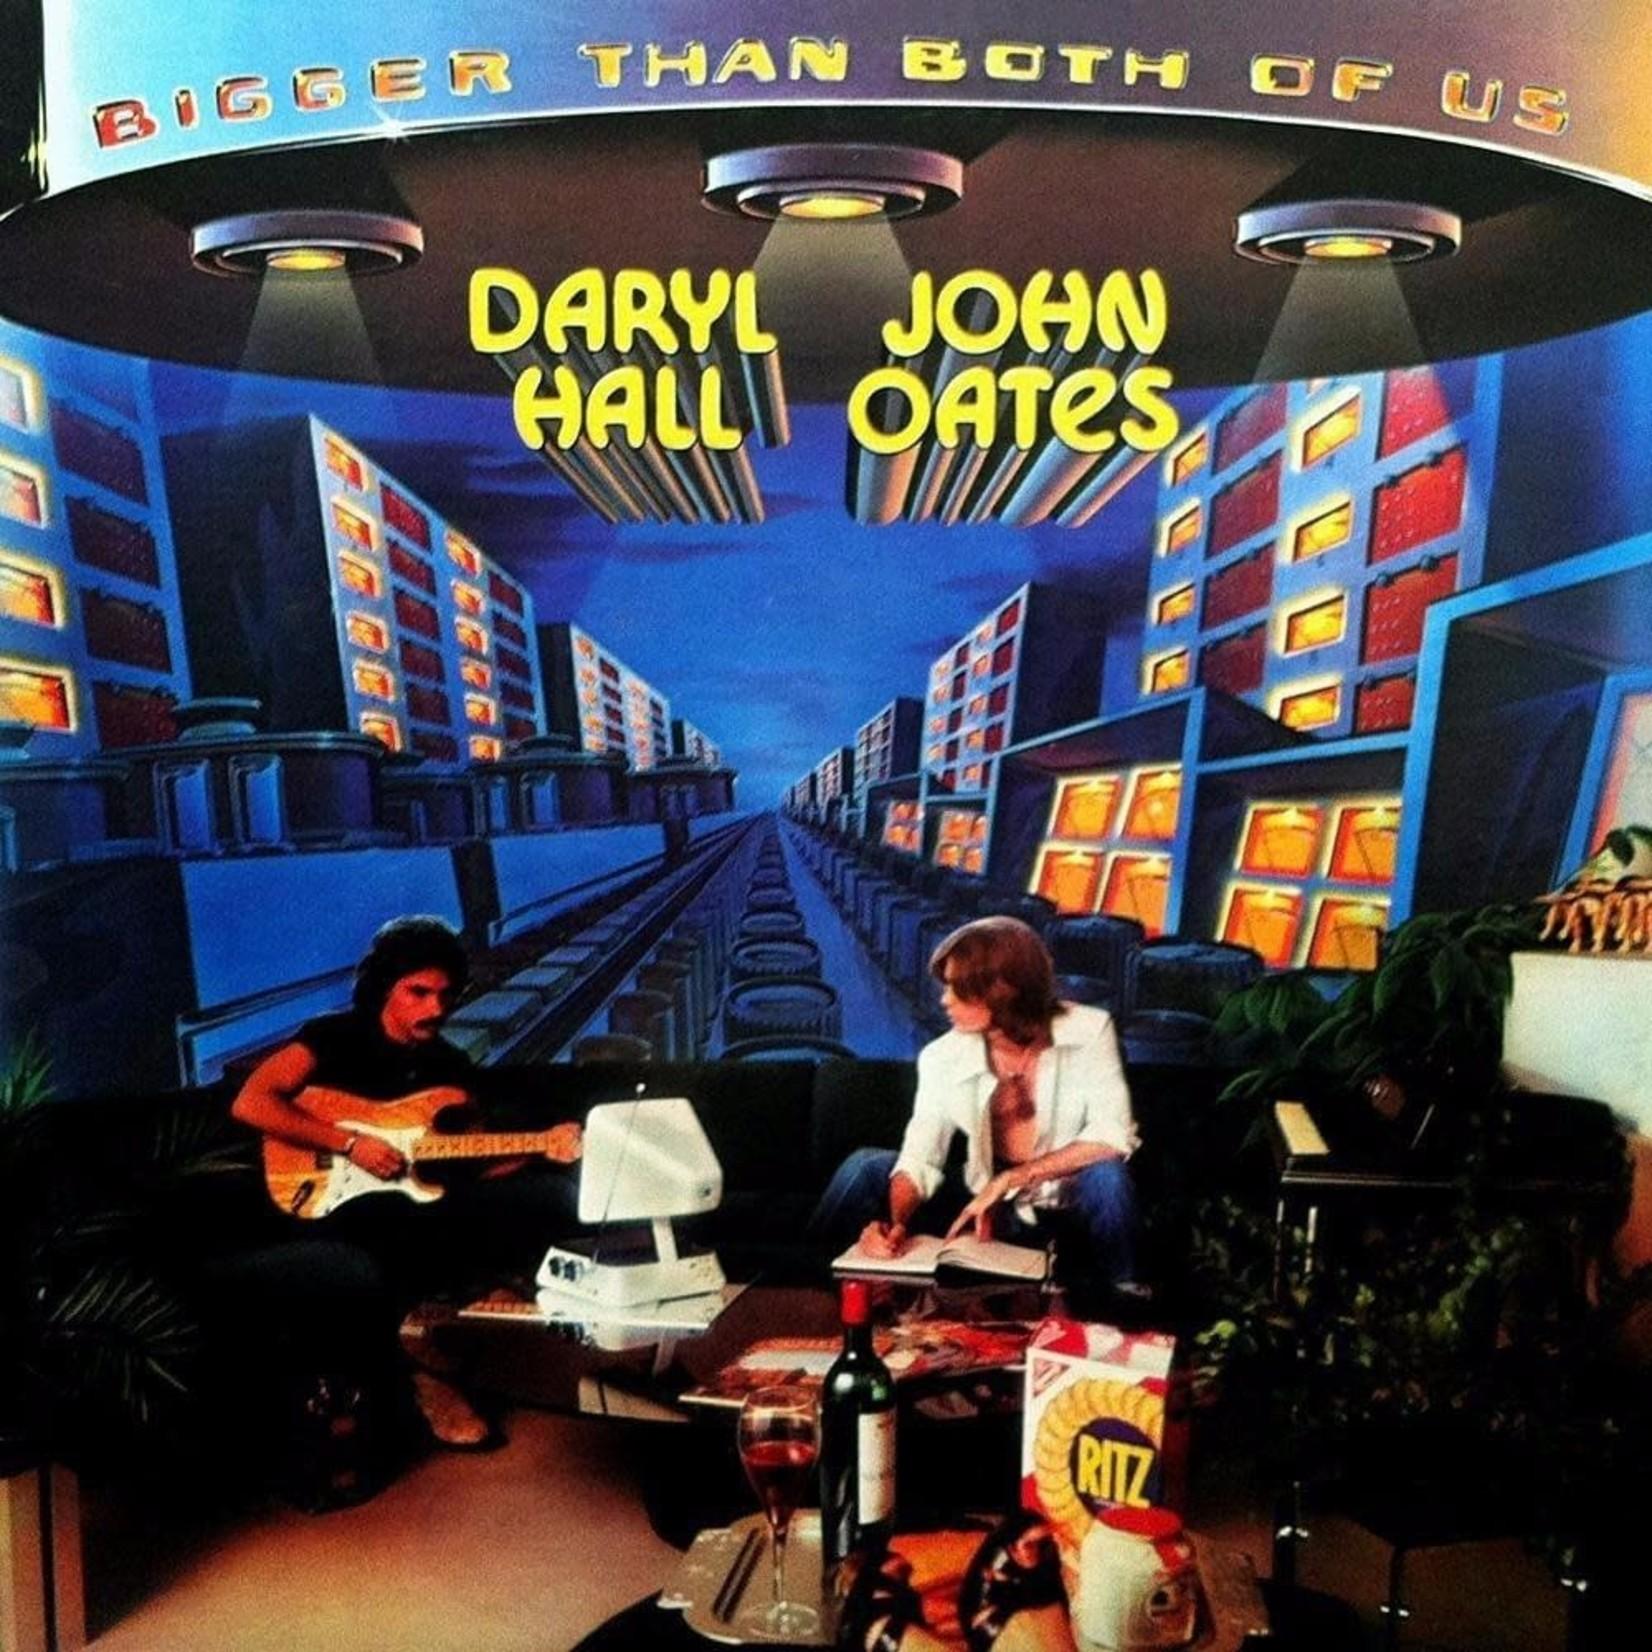 [Vintage] Hall, Daryl & John Oates: Bigger Than Both of Us